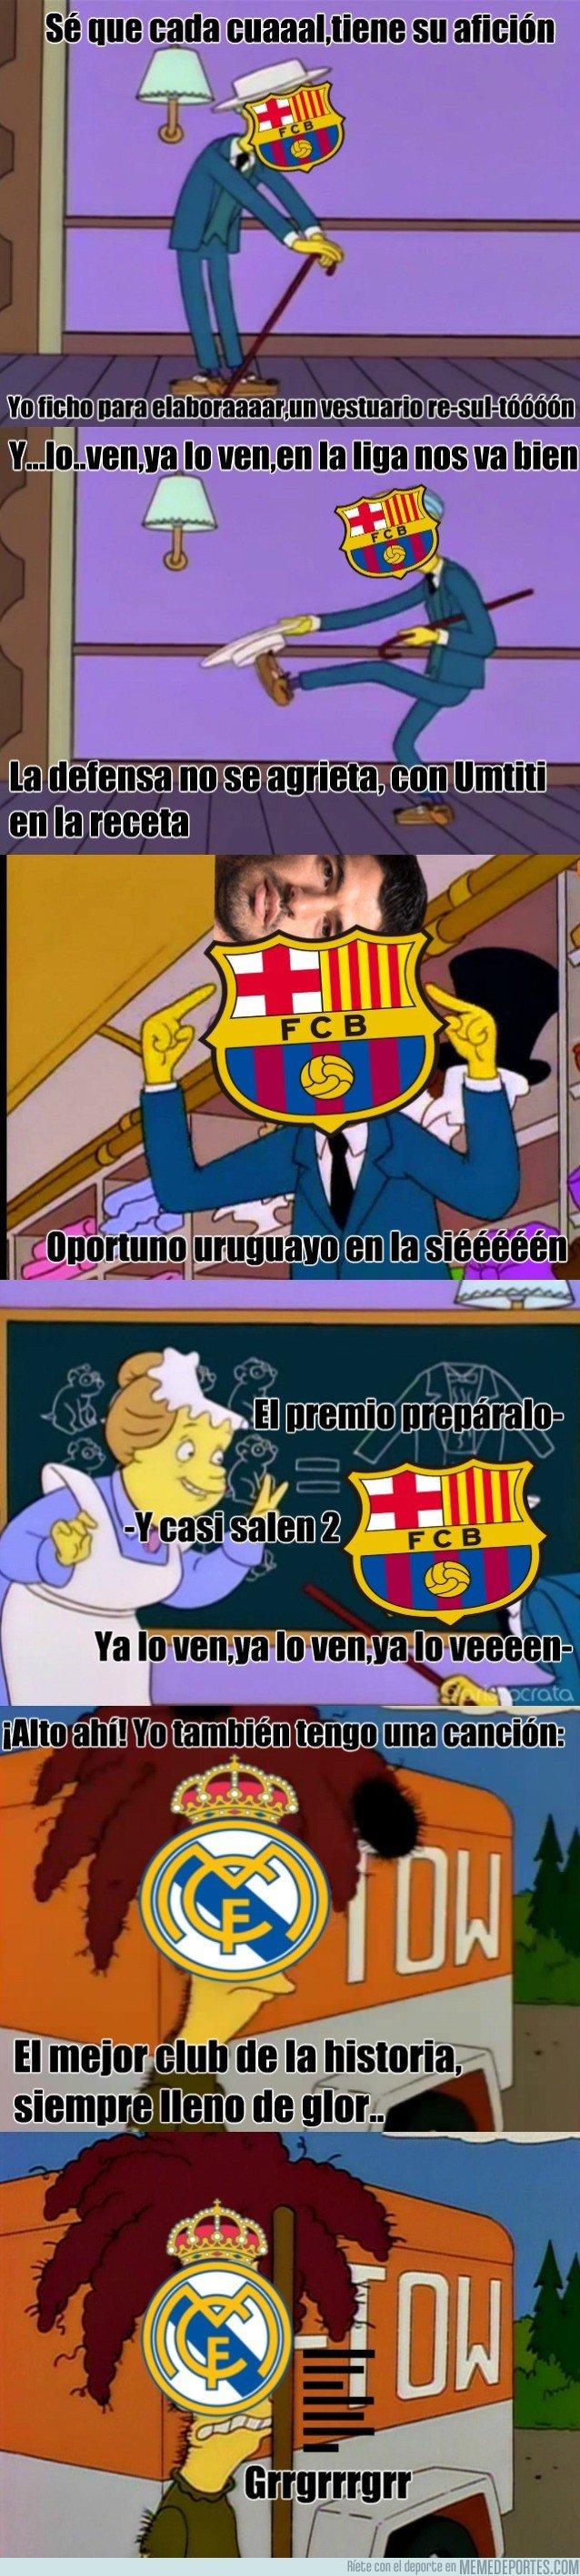 1017558 - Las ligas para el Barça van fetén